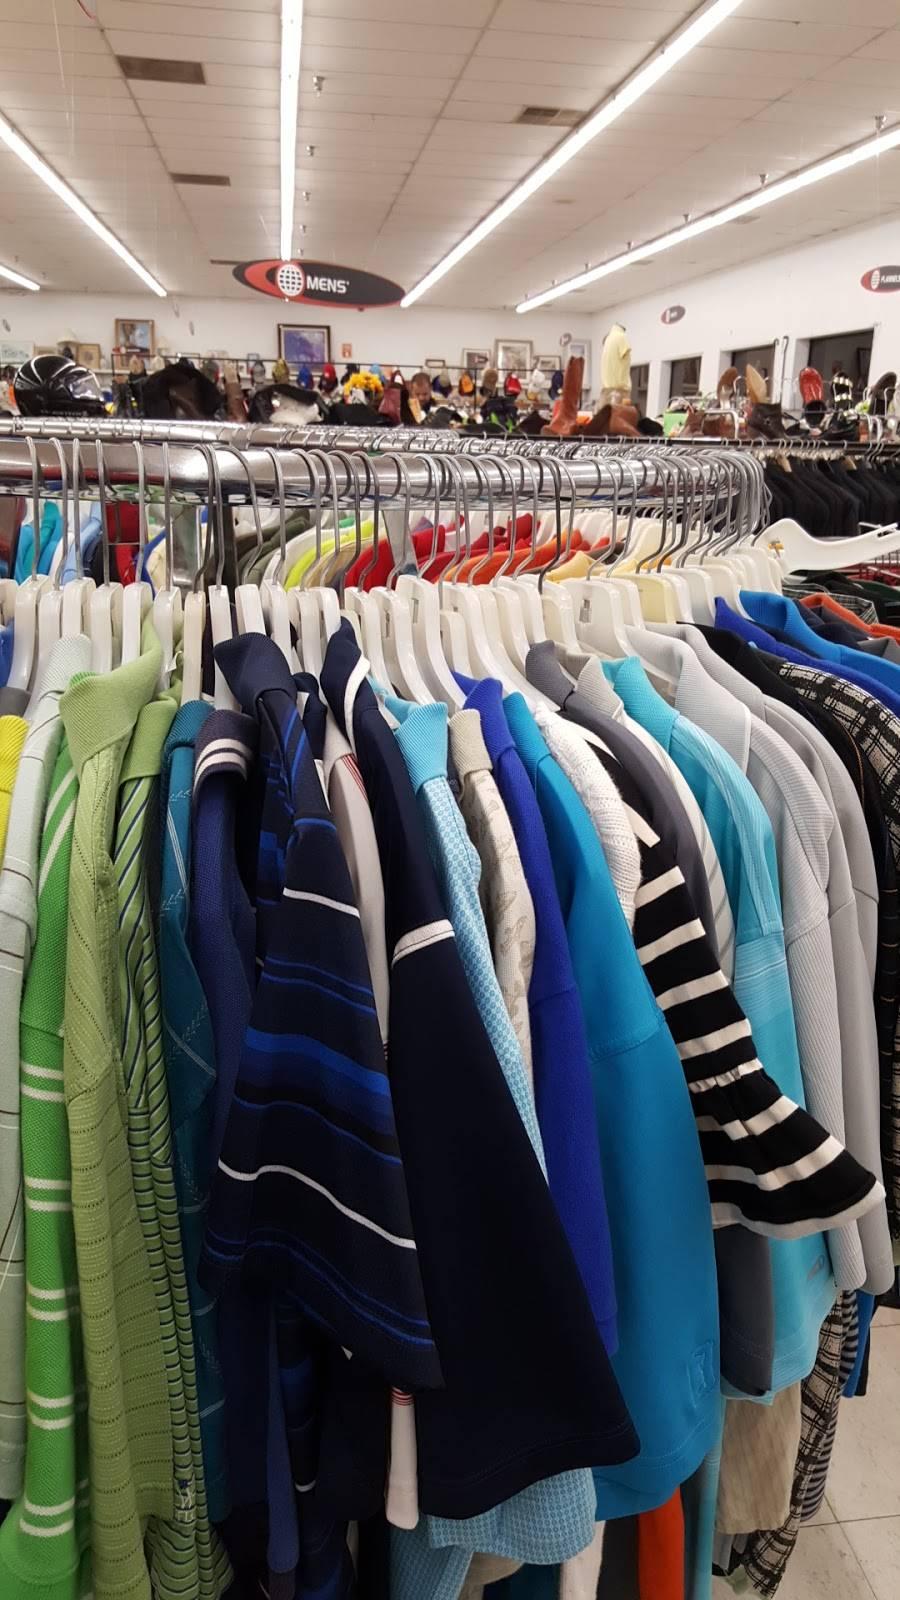 Value World - clothing store  | Photo 5 of 7 | Address: 2001 E Eleven Mile Rd, Warren, MI 48092, USA | Phone: (734) 728-4610